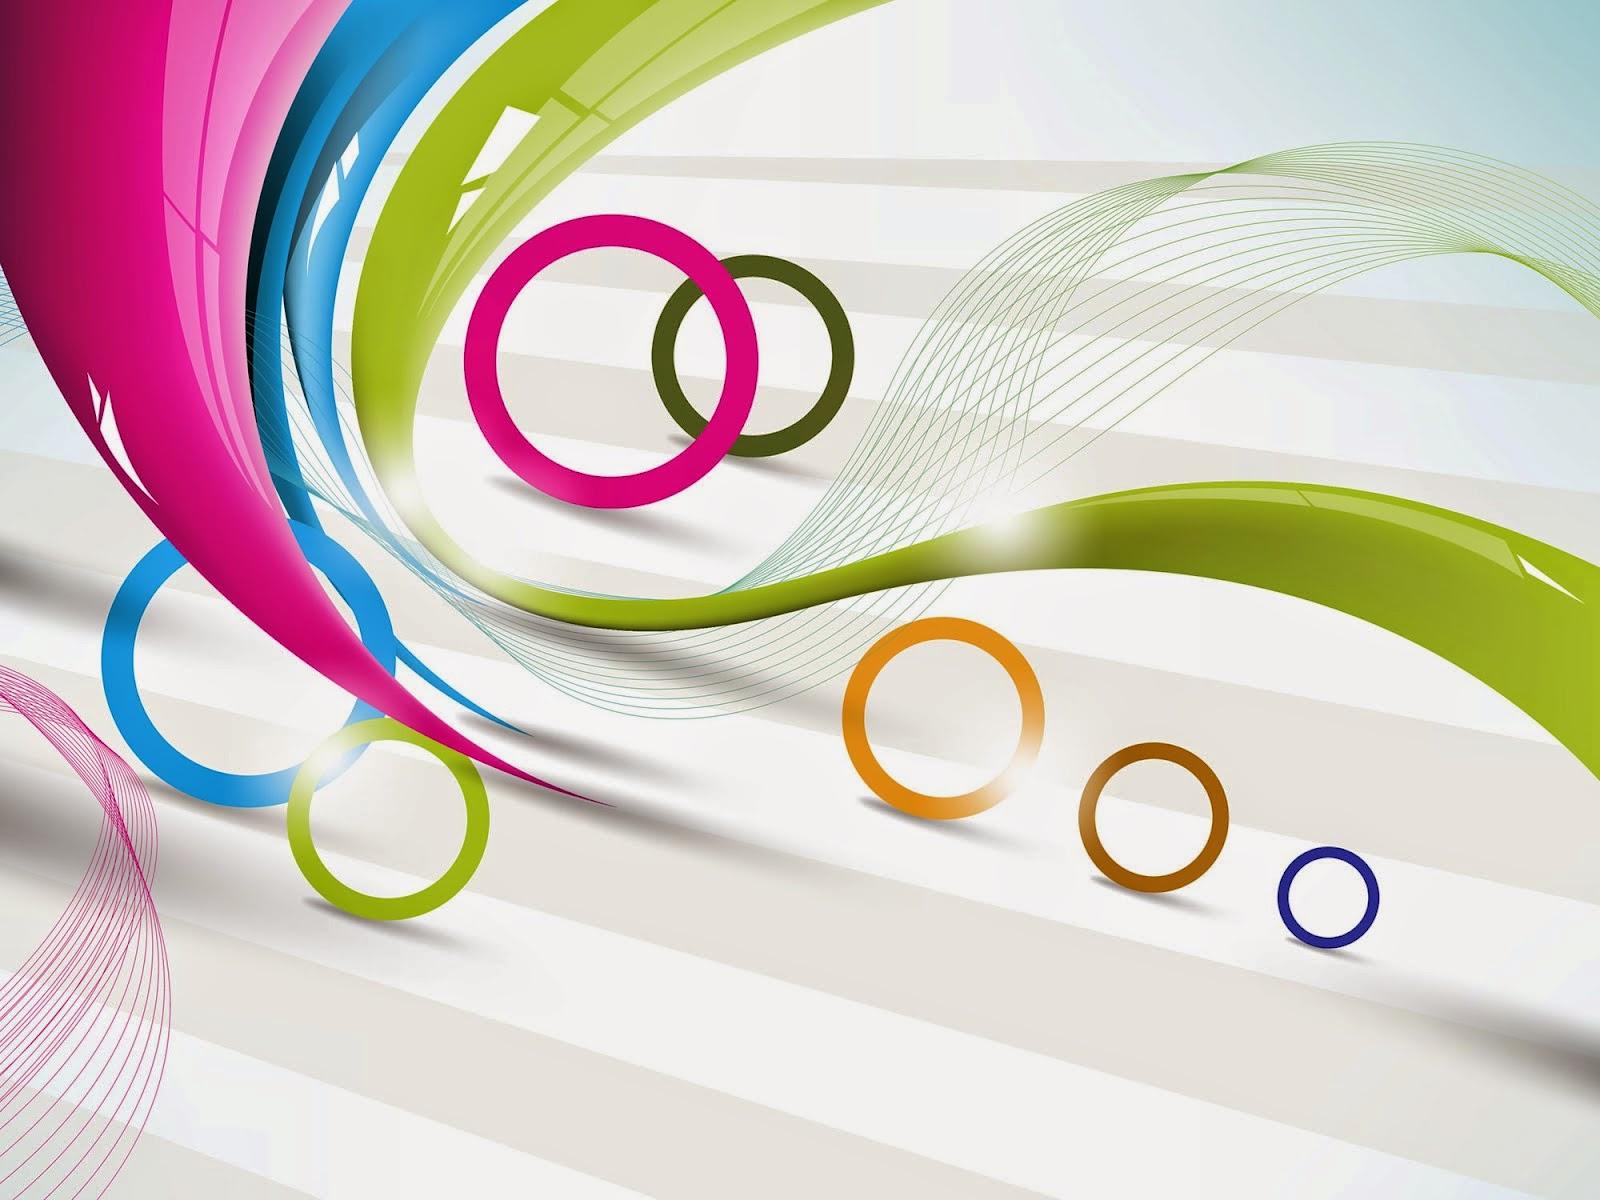 circles and lines - hd vector and art design wallpaper